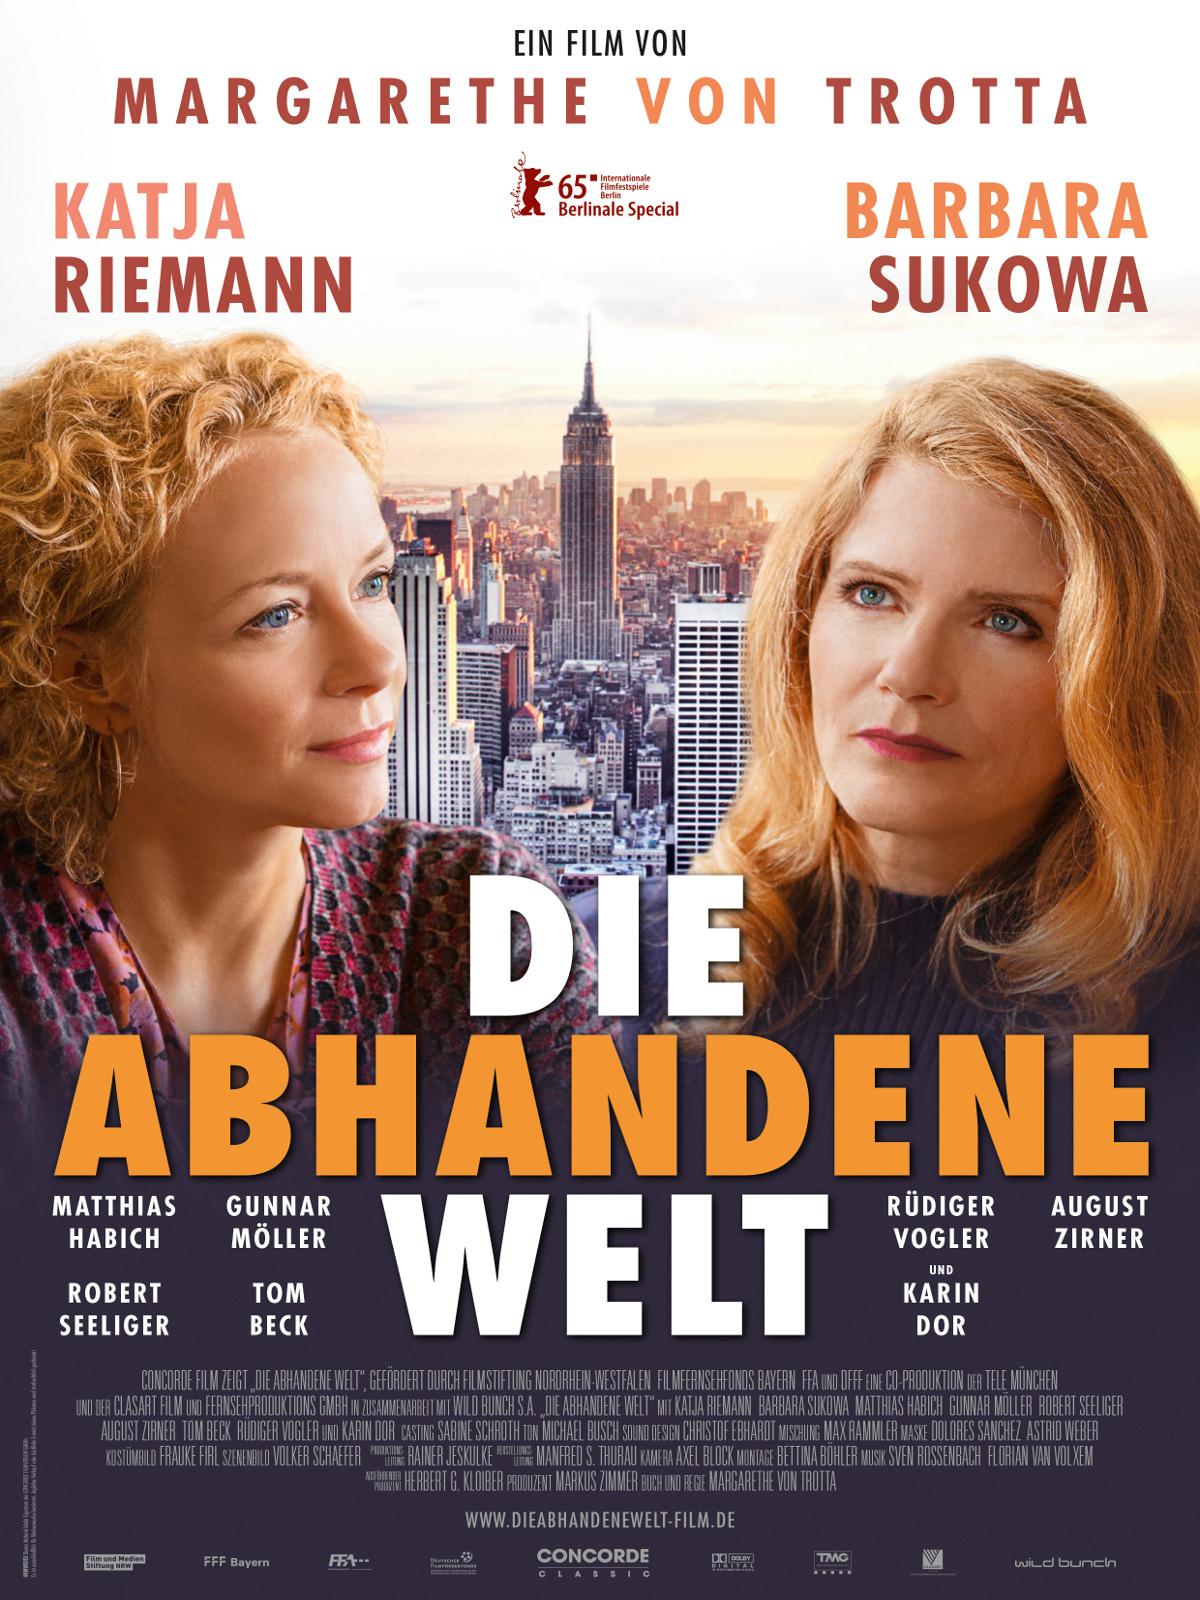 http://www.film-rezensionen.de/wp-content/uploads/2015/04/Die-abhandene-Welt.jpg